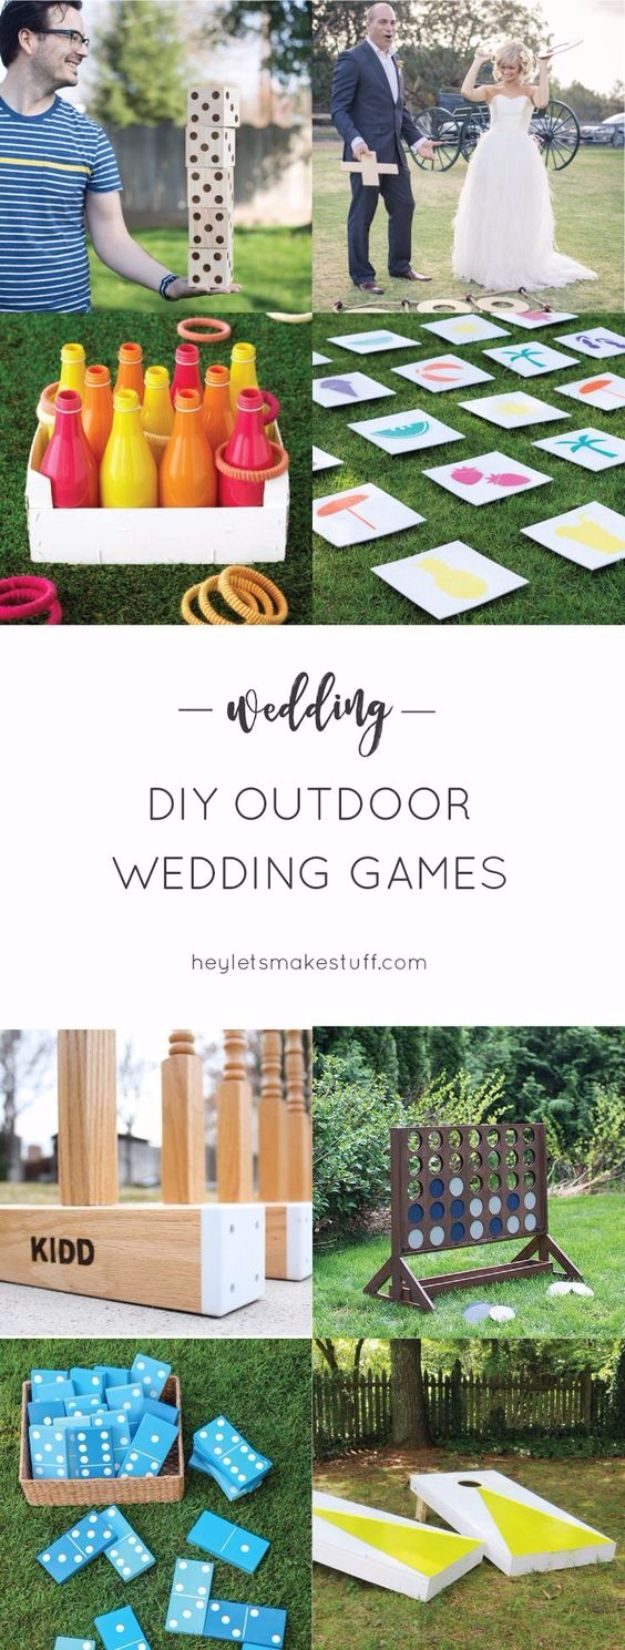 Outdoor Wedding Ideas 41 Best Diy Ideas For Your Outdoor Wedding